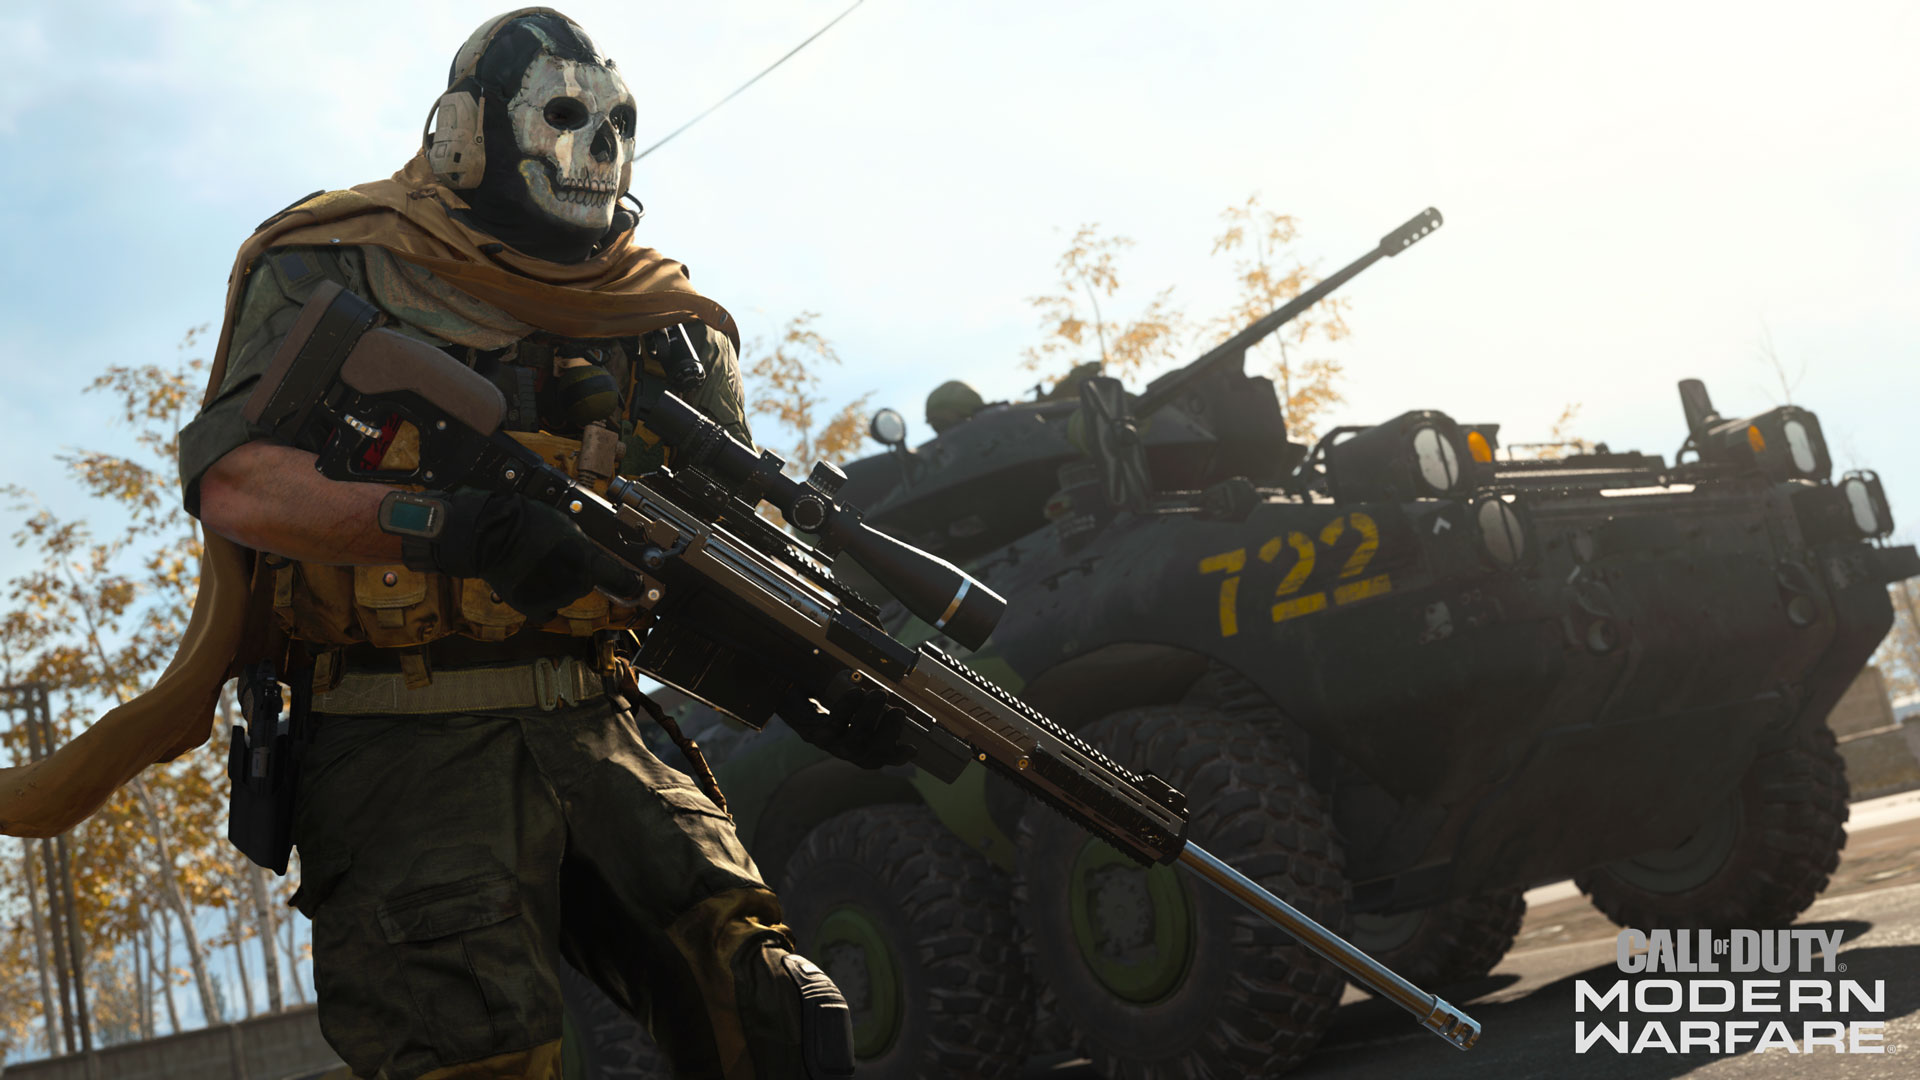 Call of Duty: Modern Warfare Season 2 brings back Ghost, Rust